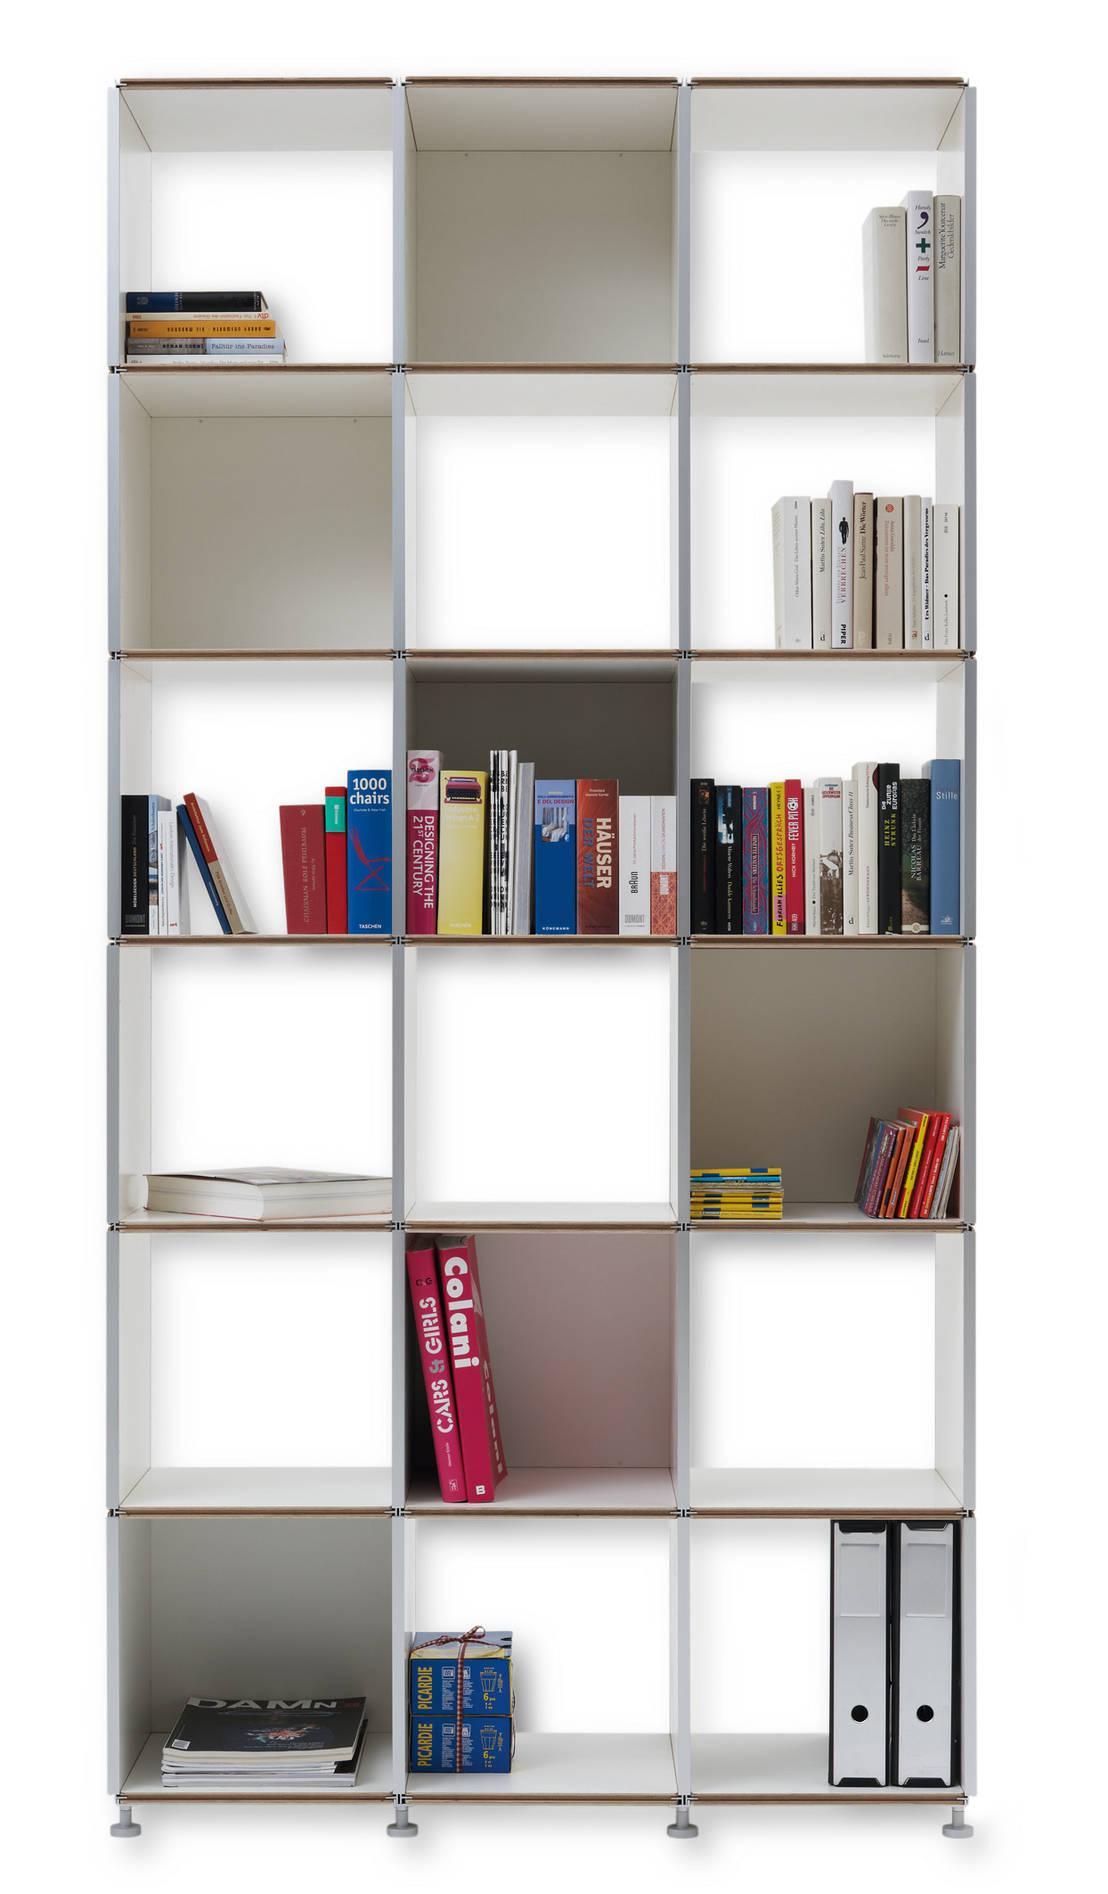 regal 1hoch3 von dominik lutz industrial design homify. Black Bedroom Furniture Sets. Home Design Ideas